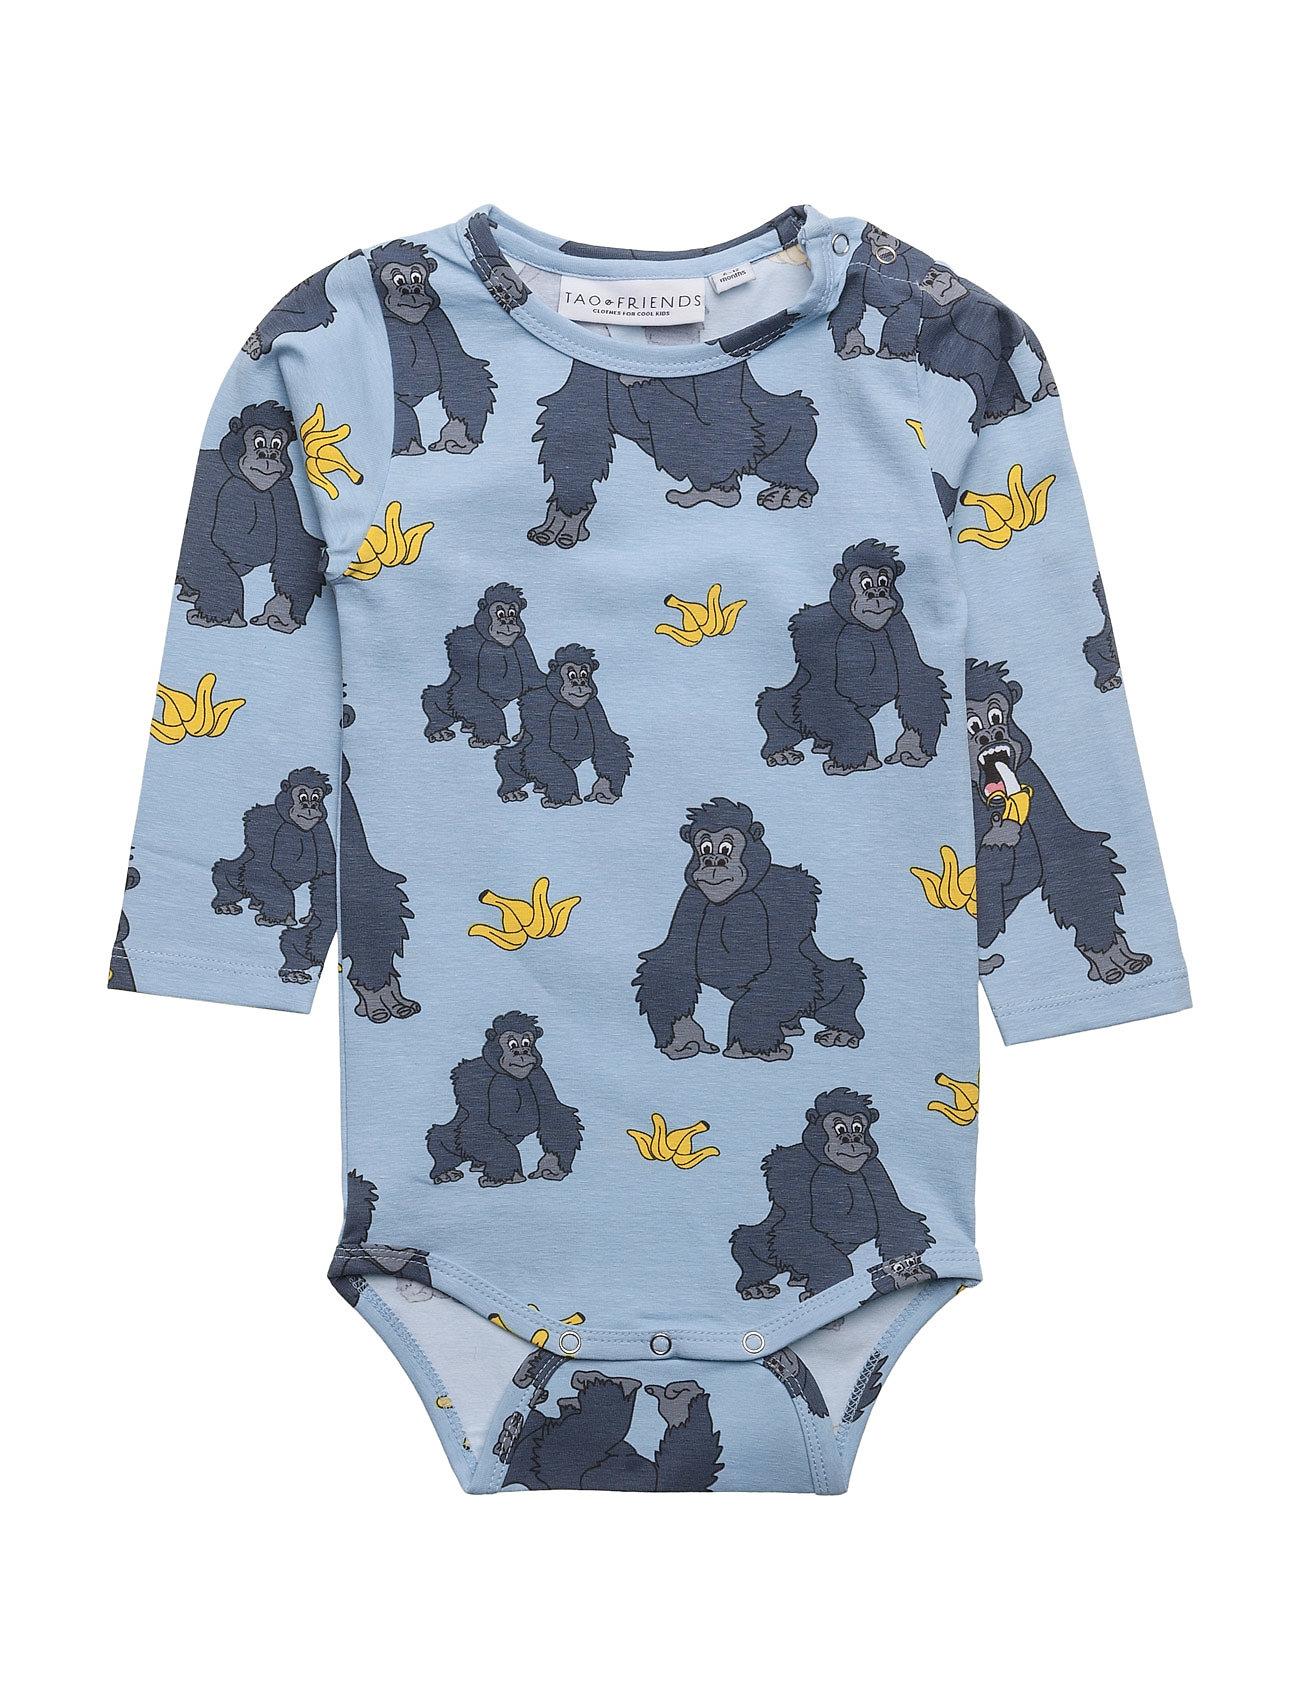 tao & friends – Baby body gorillan multi-animal blue fra boozt.com dk